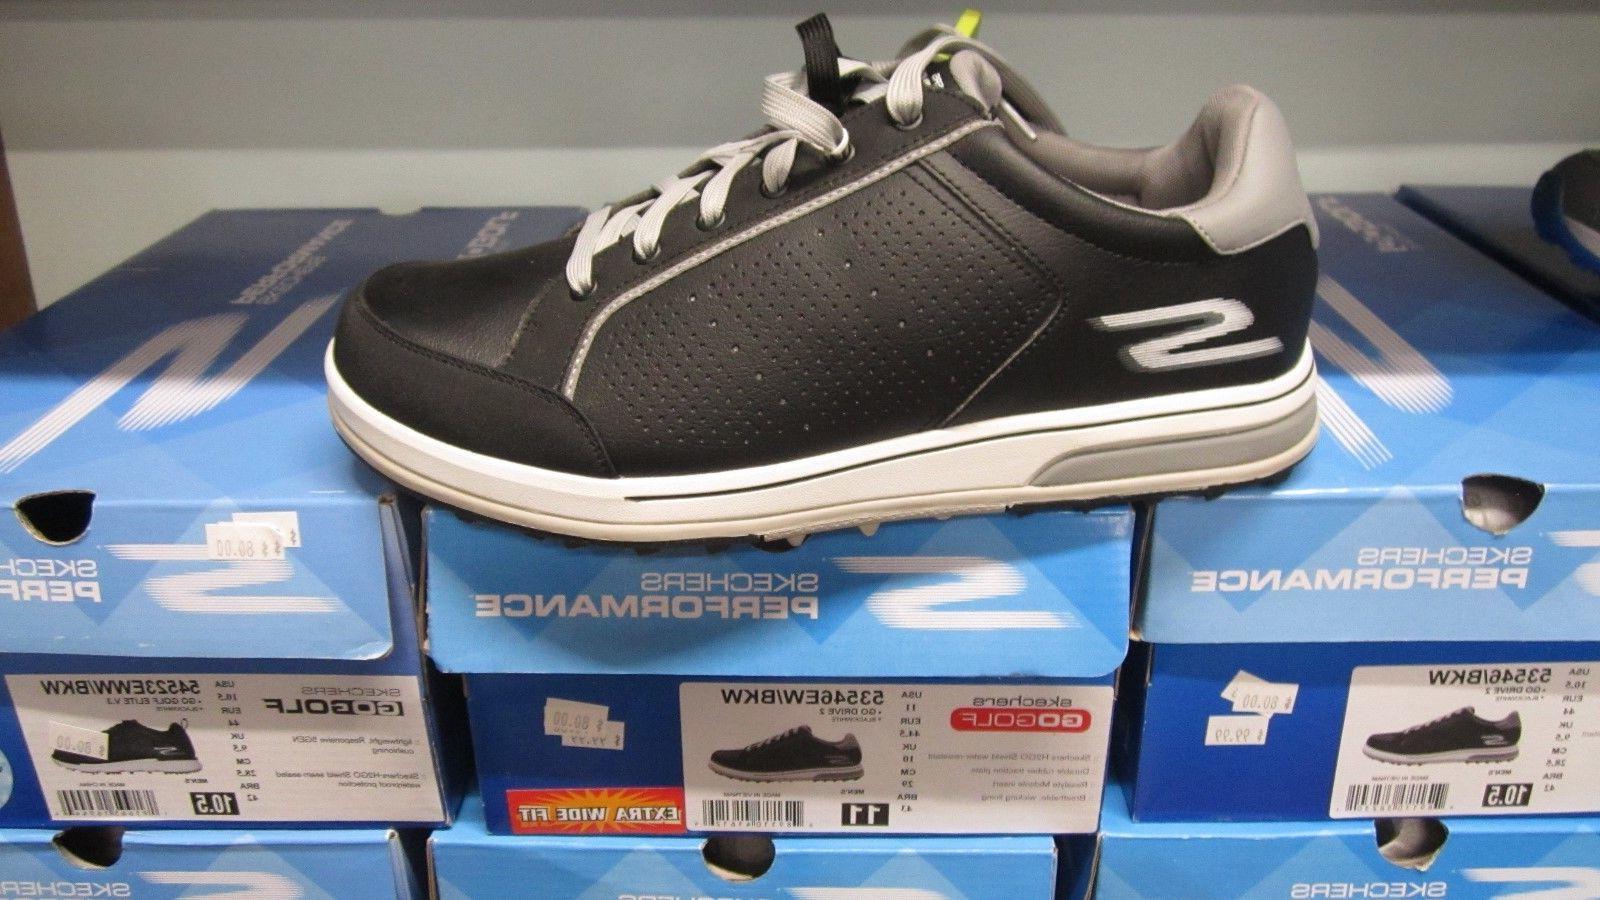 Skechers Golf V.3 Spikeless Golf Shoes 54523 11W